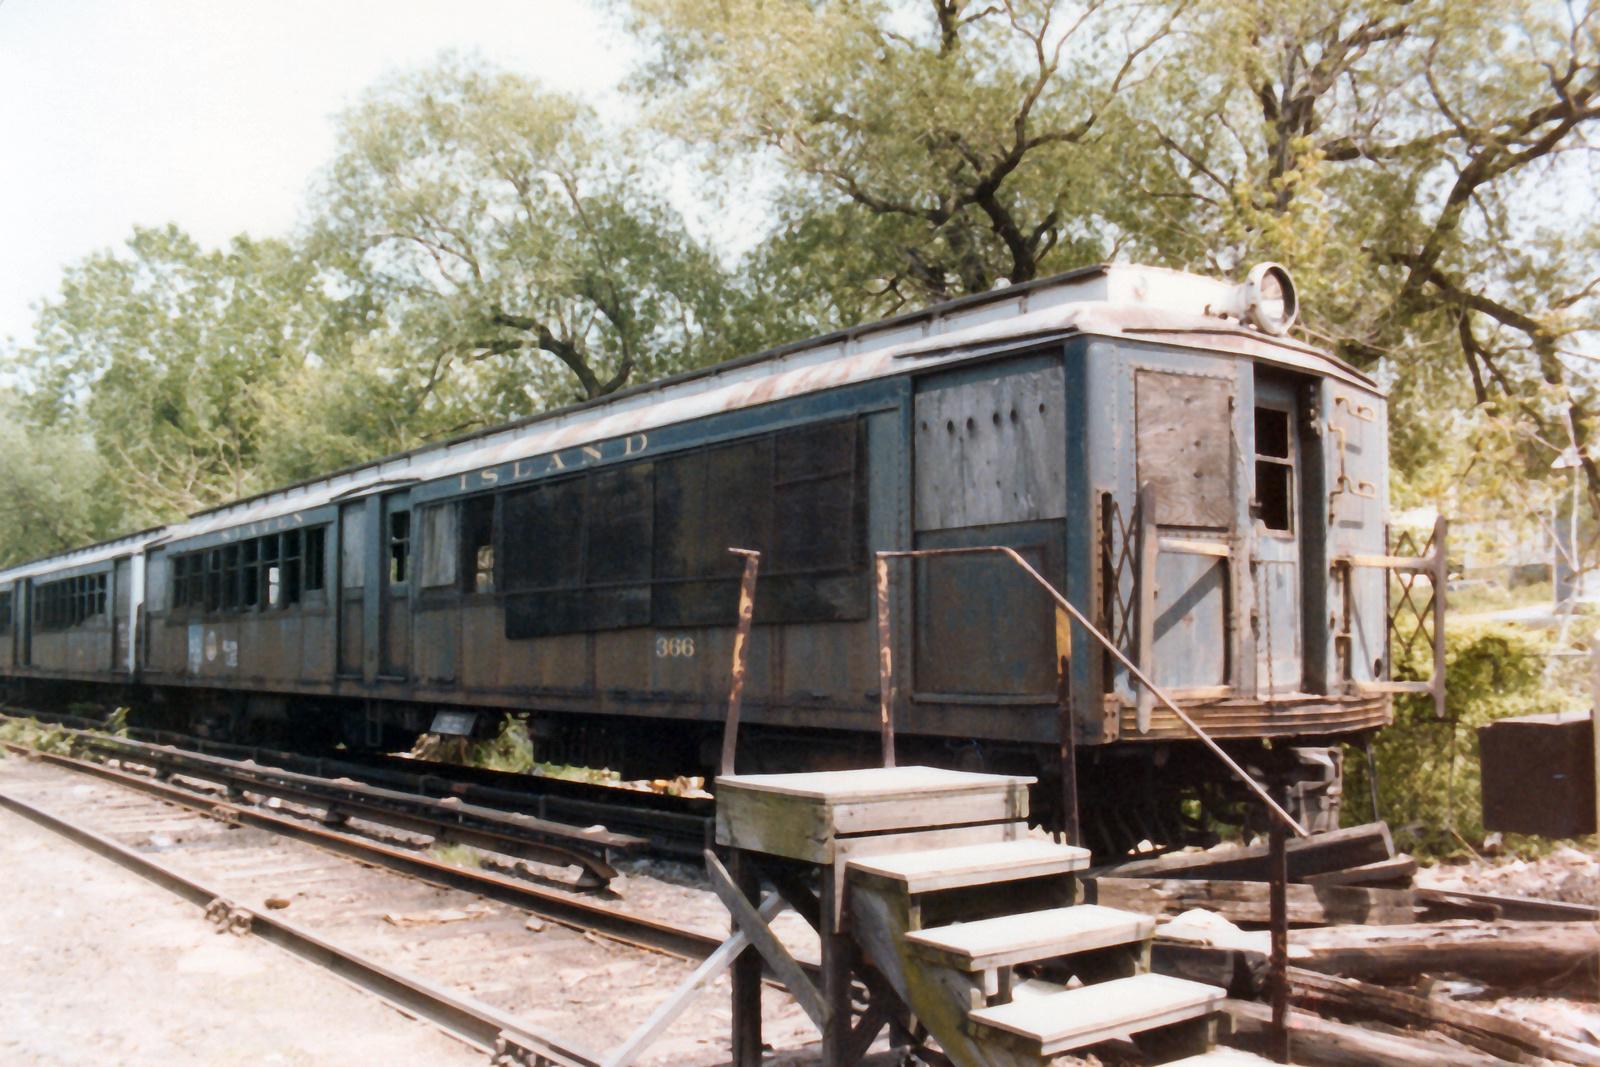 (797k, 1600x1067)<br><b>Country:</b> United States<br><b>City:</b> New York<br><b>System:</b> New York City Transit<br><b>Line:</b> SIRT<br><b>Location:</b> Tottenville <br><b>Car:</b> SIRT ME-1 (Motor) 366 <br><b>Collection of:</b> Nicholas Fabrizio<br><b>Date:</b> 5/21/1984<br><b>Viewed (this week/total):</b> 2 / 356